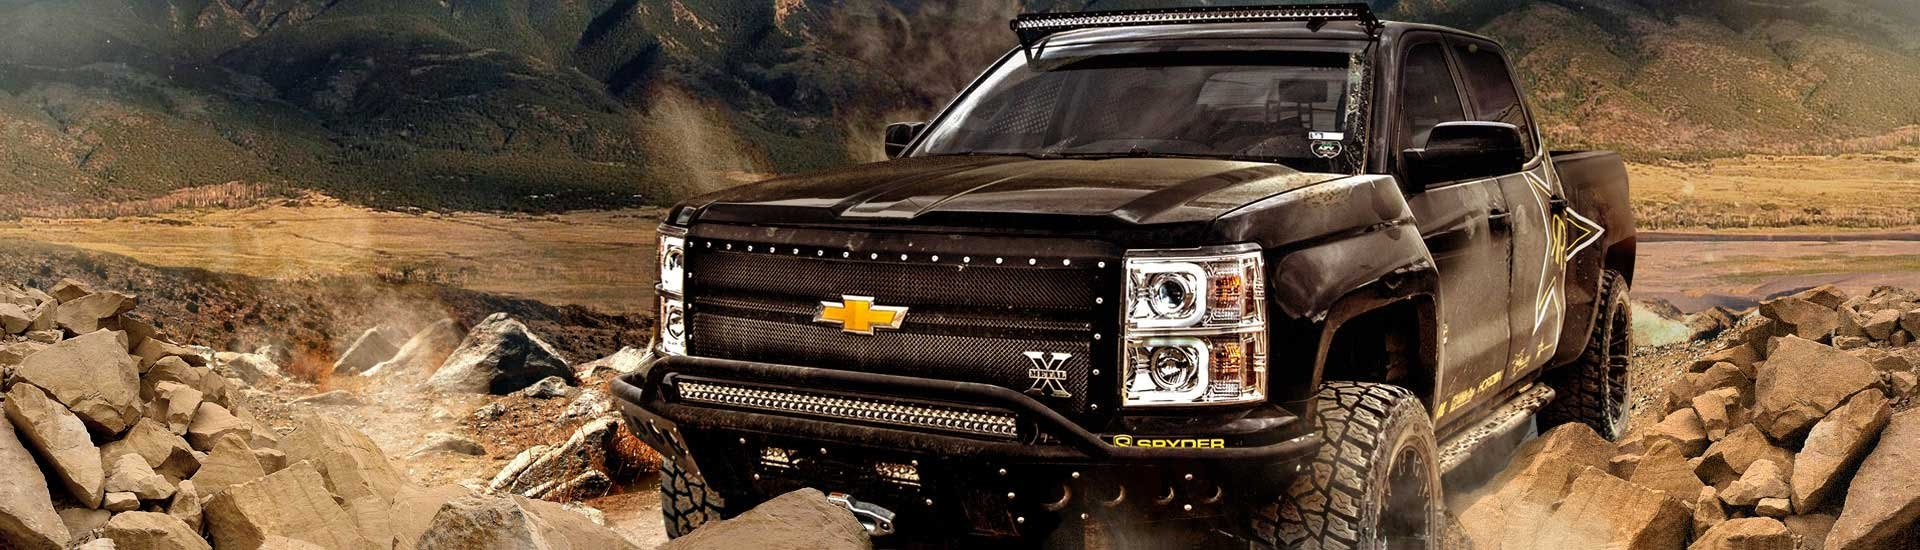 truck parts accessories. Black Bedroom Furniture Sets. Home Design Ideas